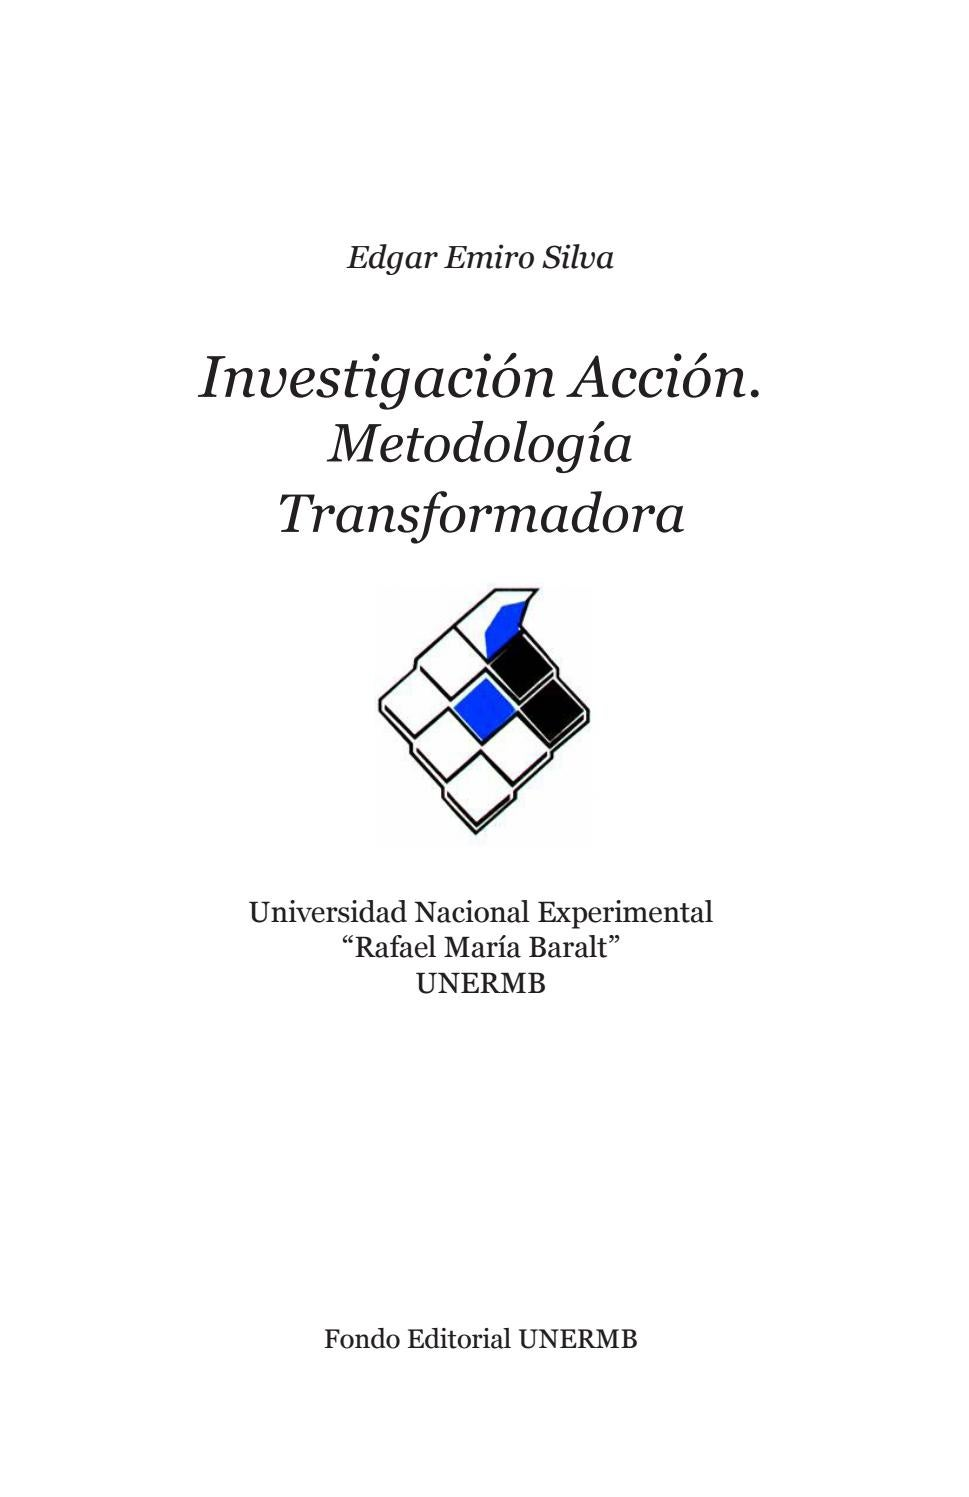 Investigacion accion metodologia transformadora by Félix2401 - issuu